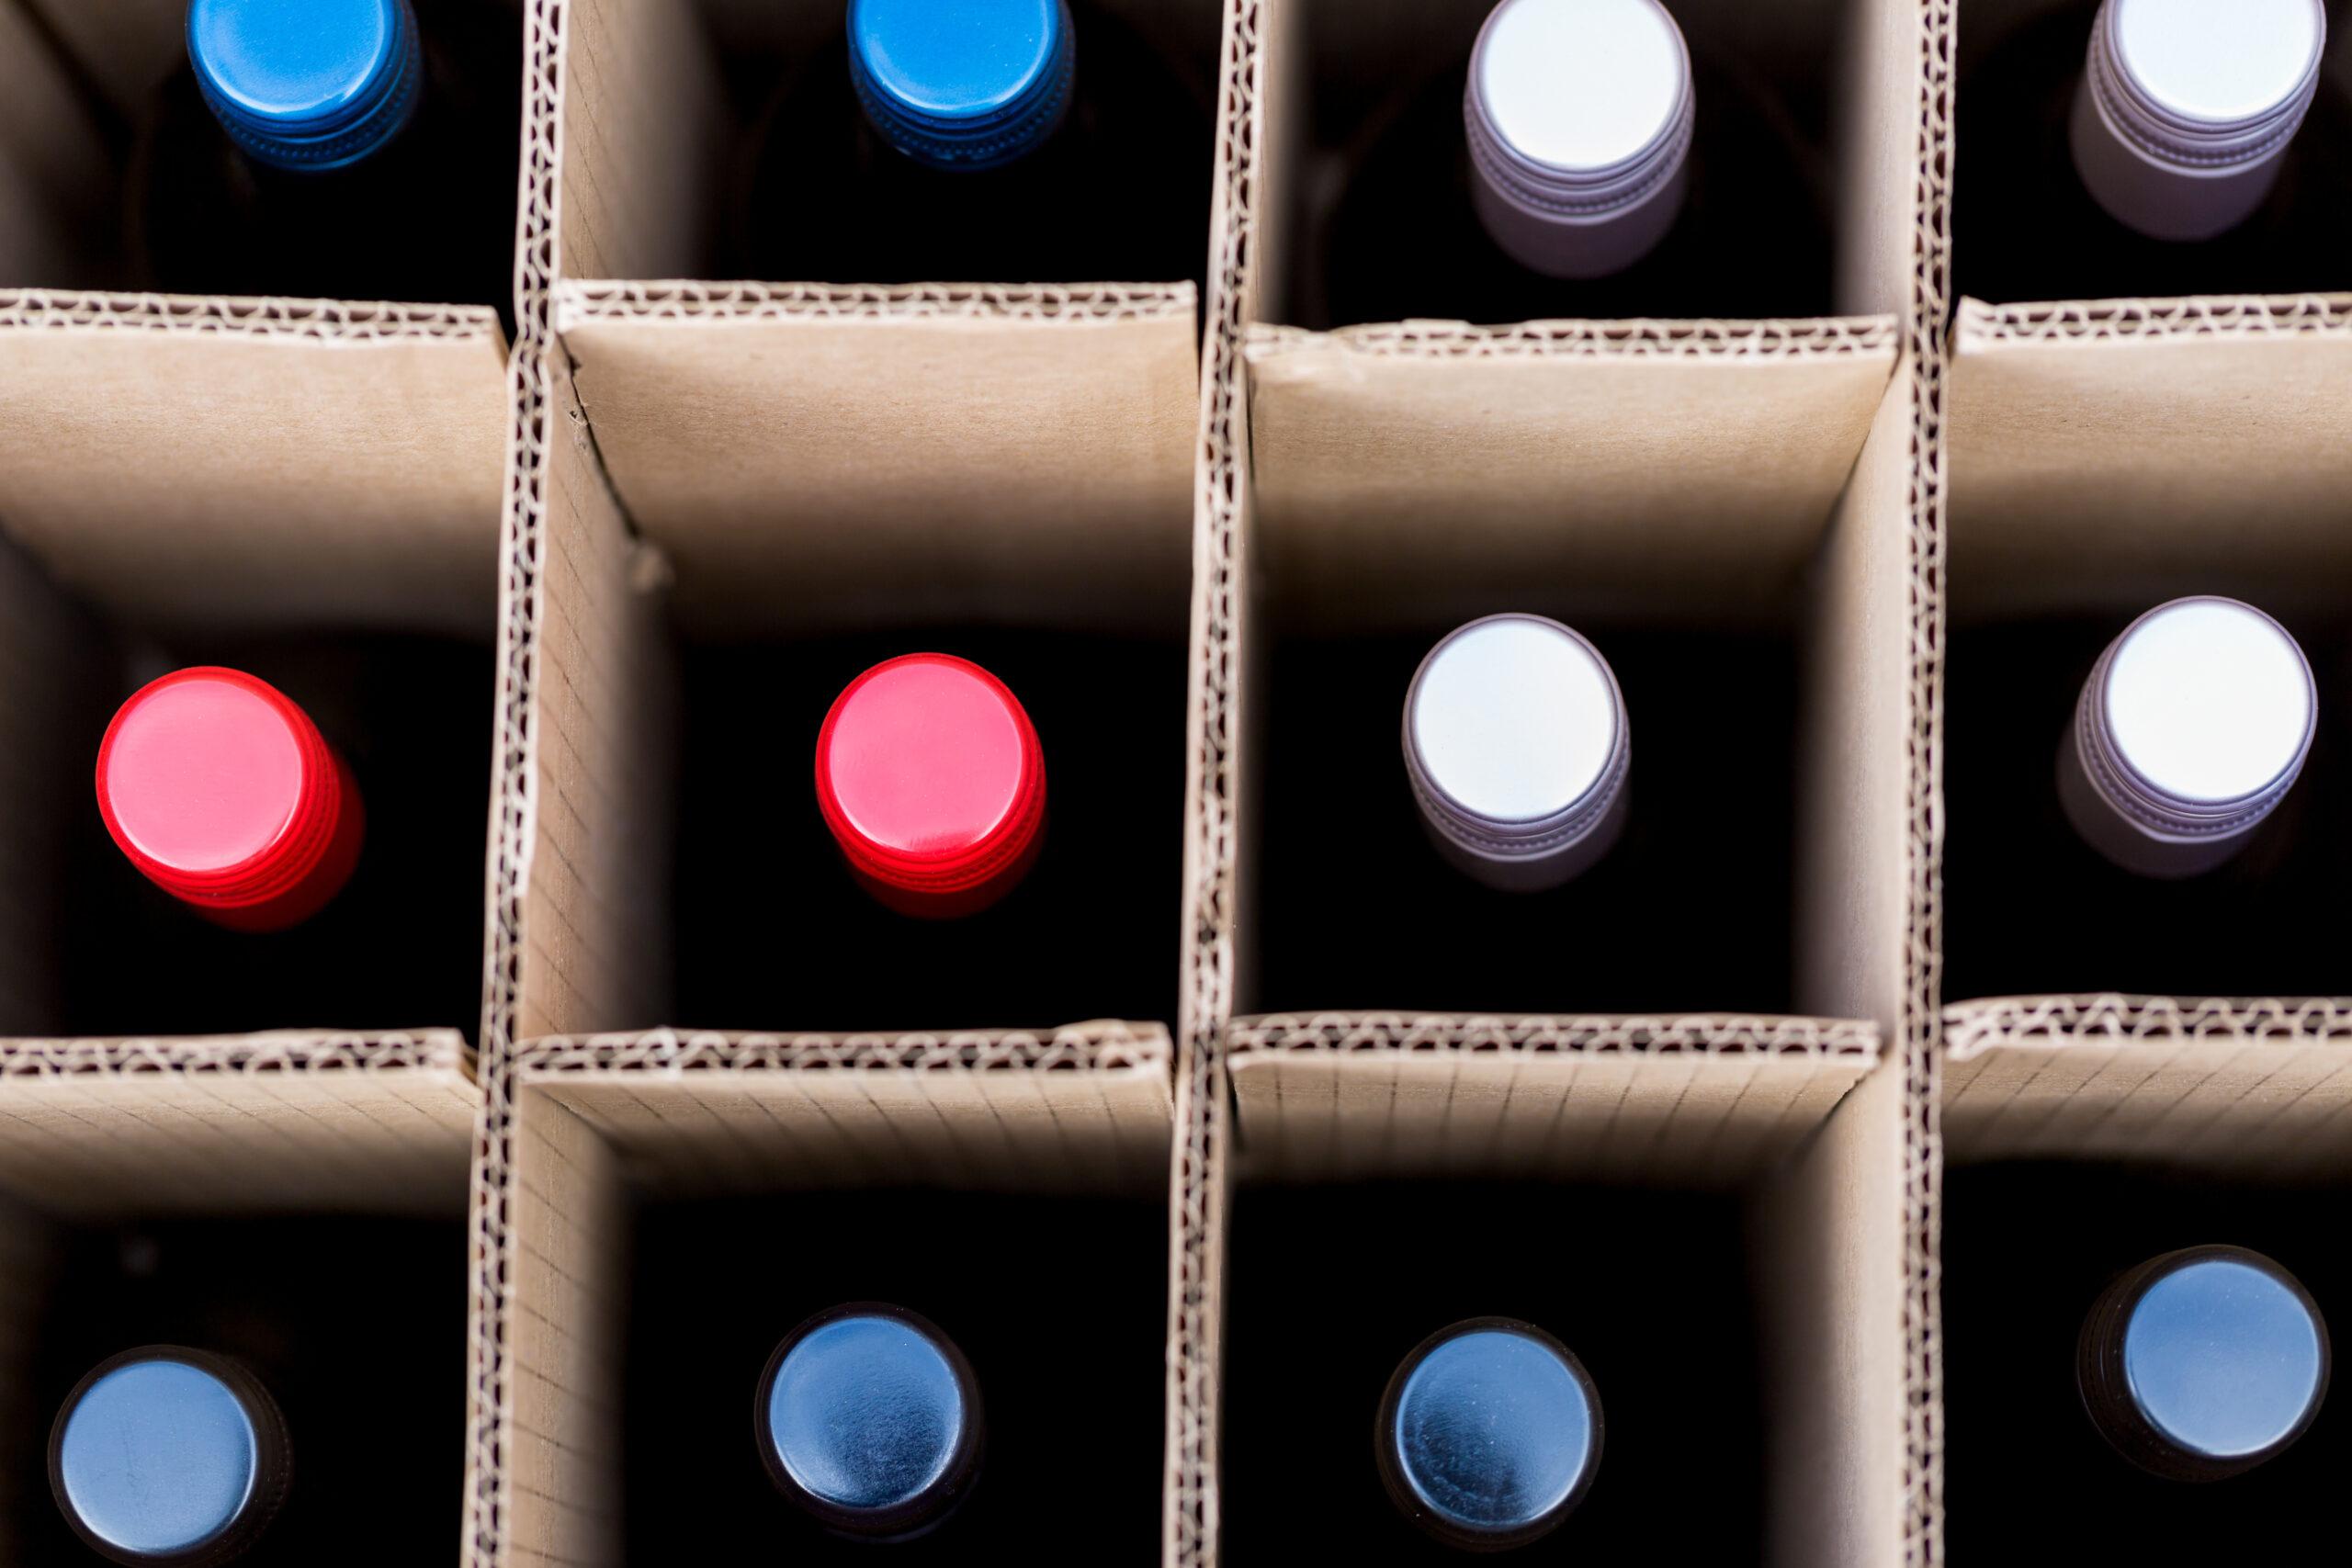 Vinography Unboxed: Week Of 8/30/20 : Vinography photo